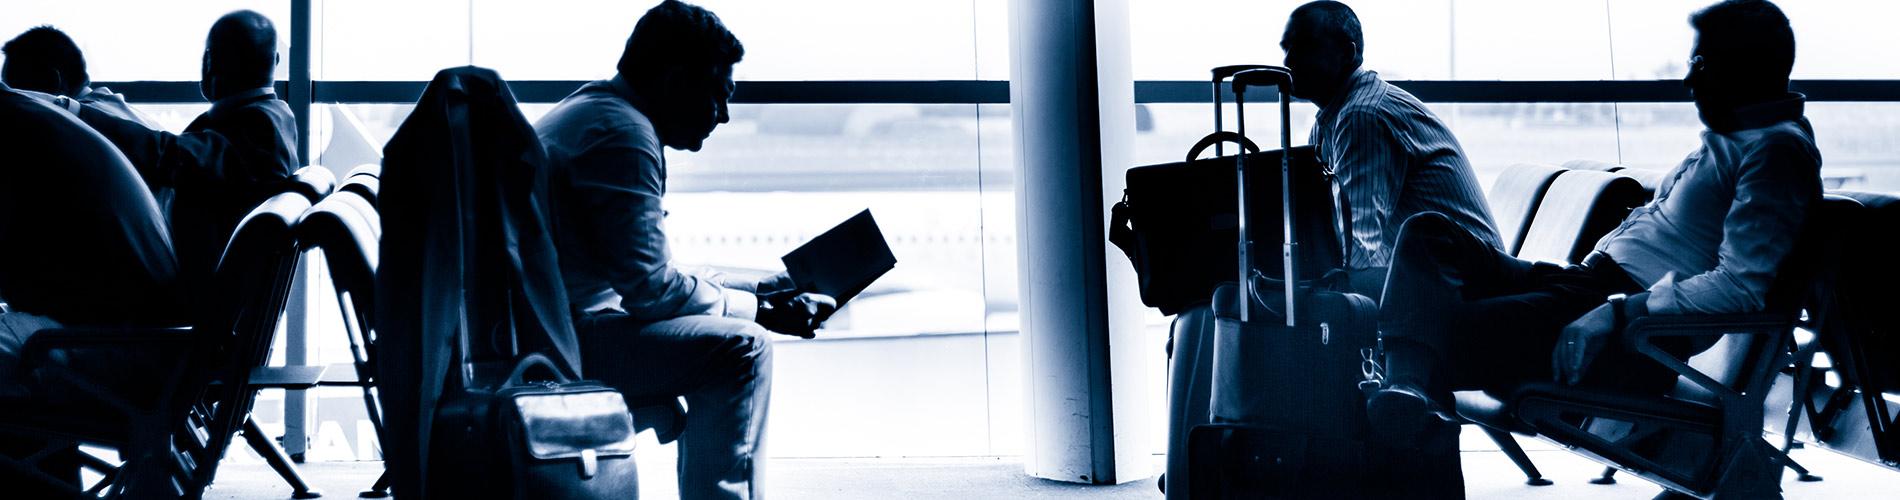 Risarcimento e rimborso ritardo aereo